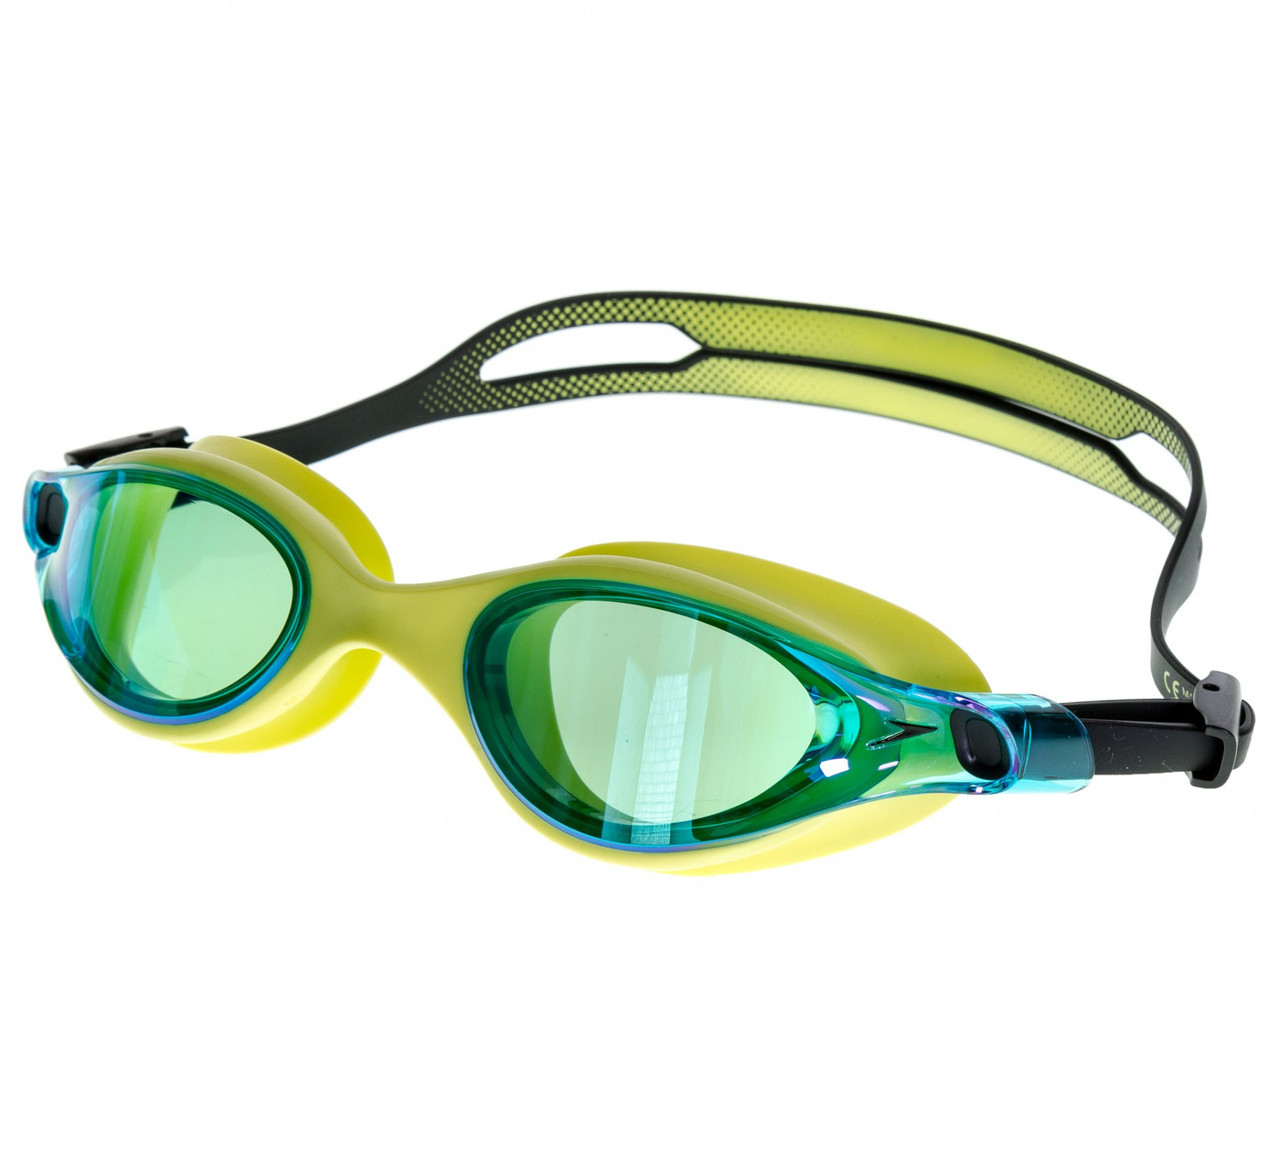 Очки для плавания Speedo vue mirror gog au green/blue (MD)